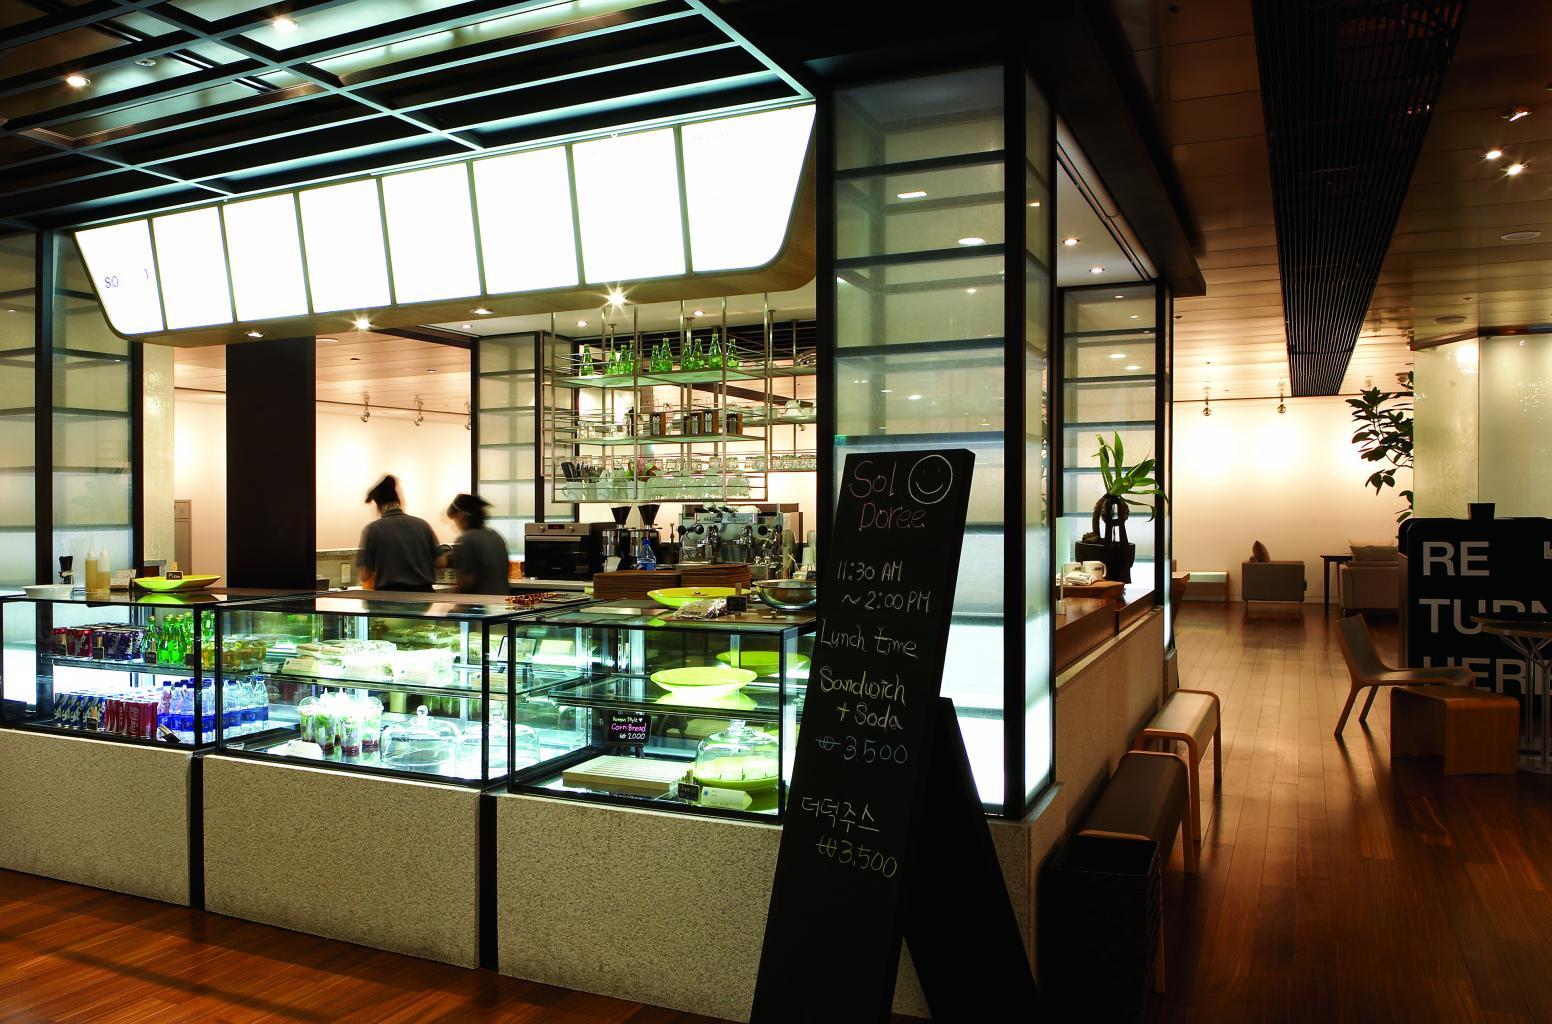 Recuni Uni Pictures Cafe at Solbridge